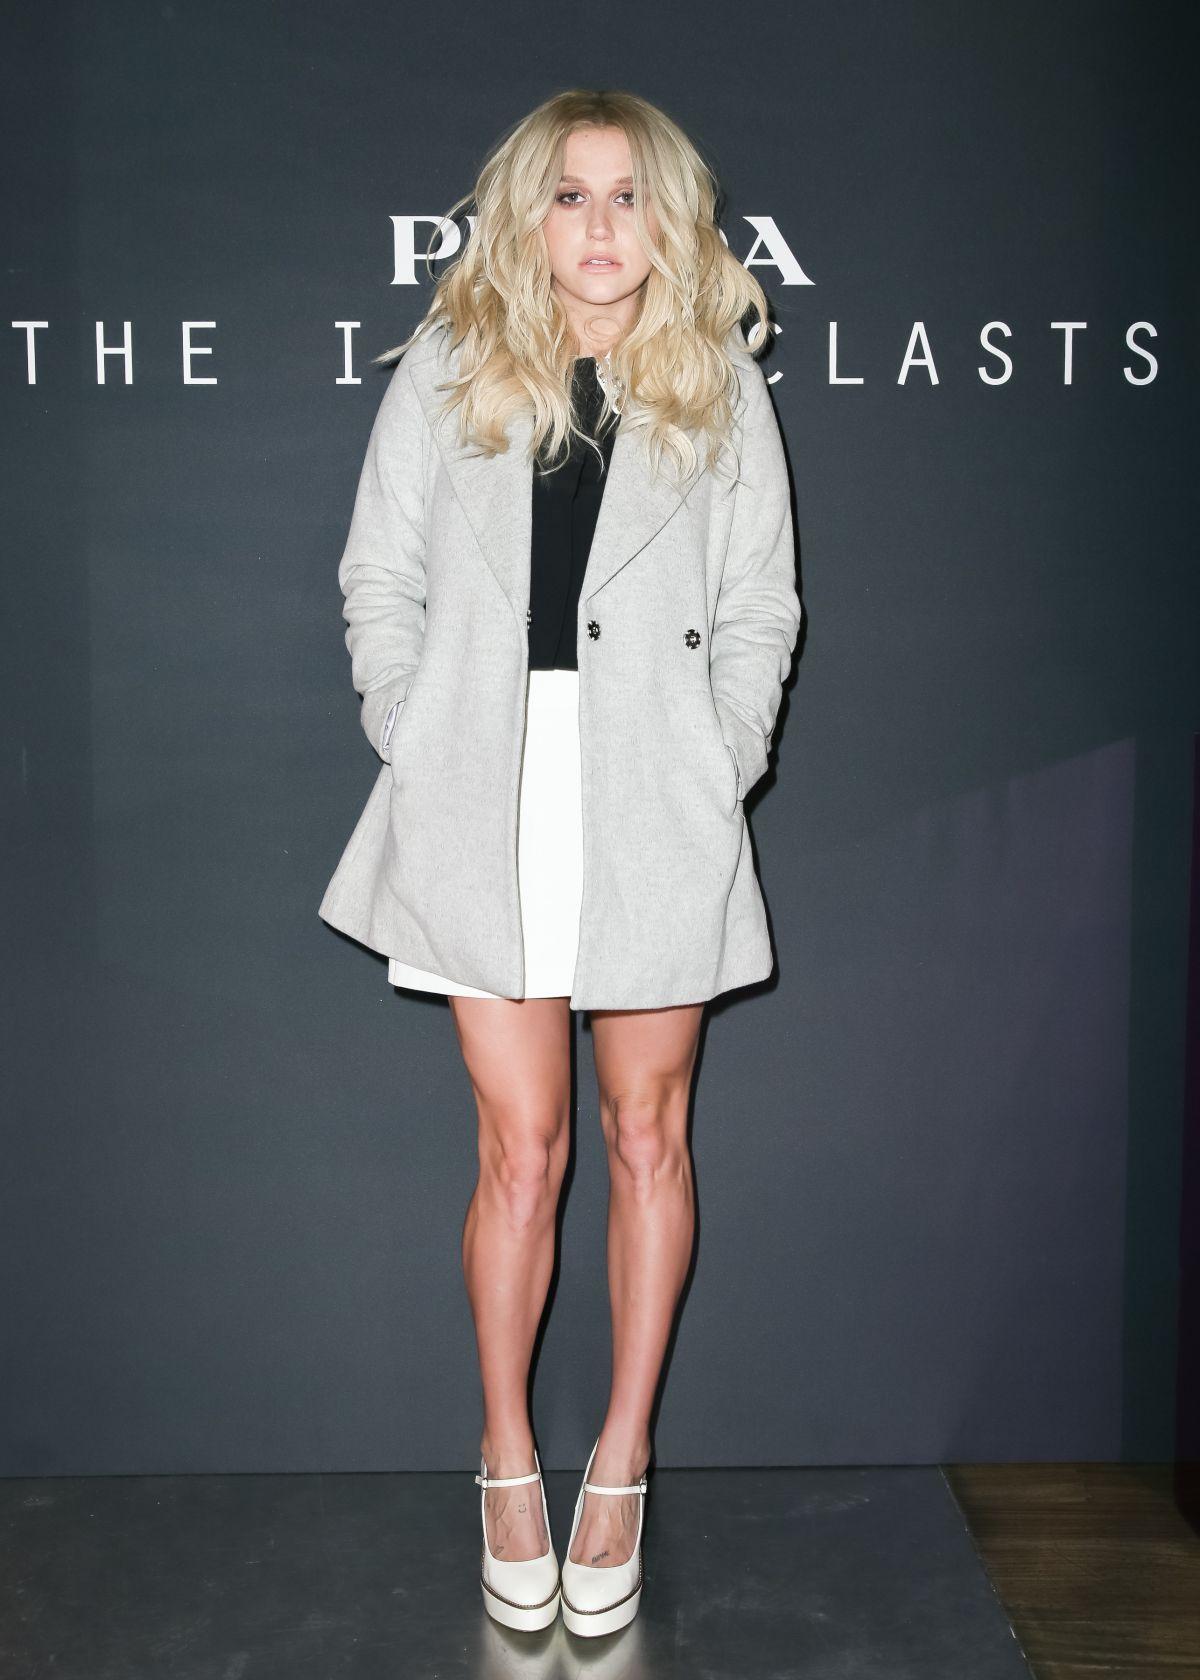 KESHA at Prada Presents The Iconoclasts in New York